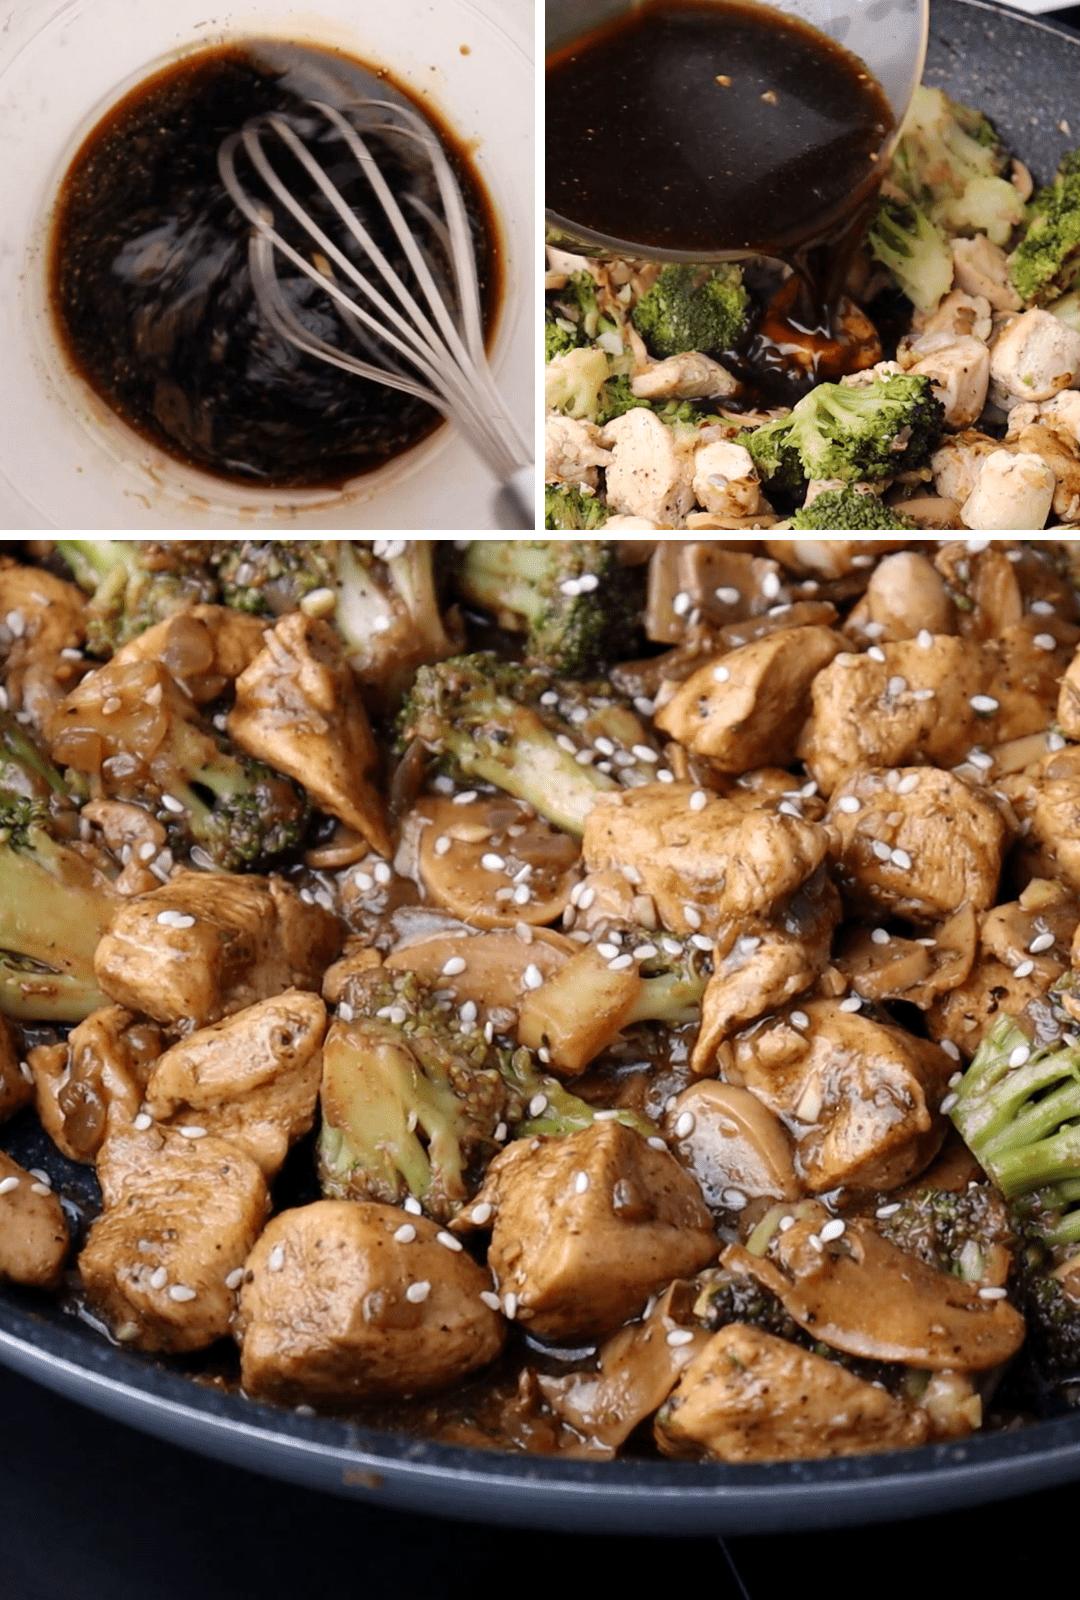 keto-chicken-broccoli-stir-fry-sauce-procedure-collage